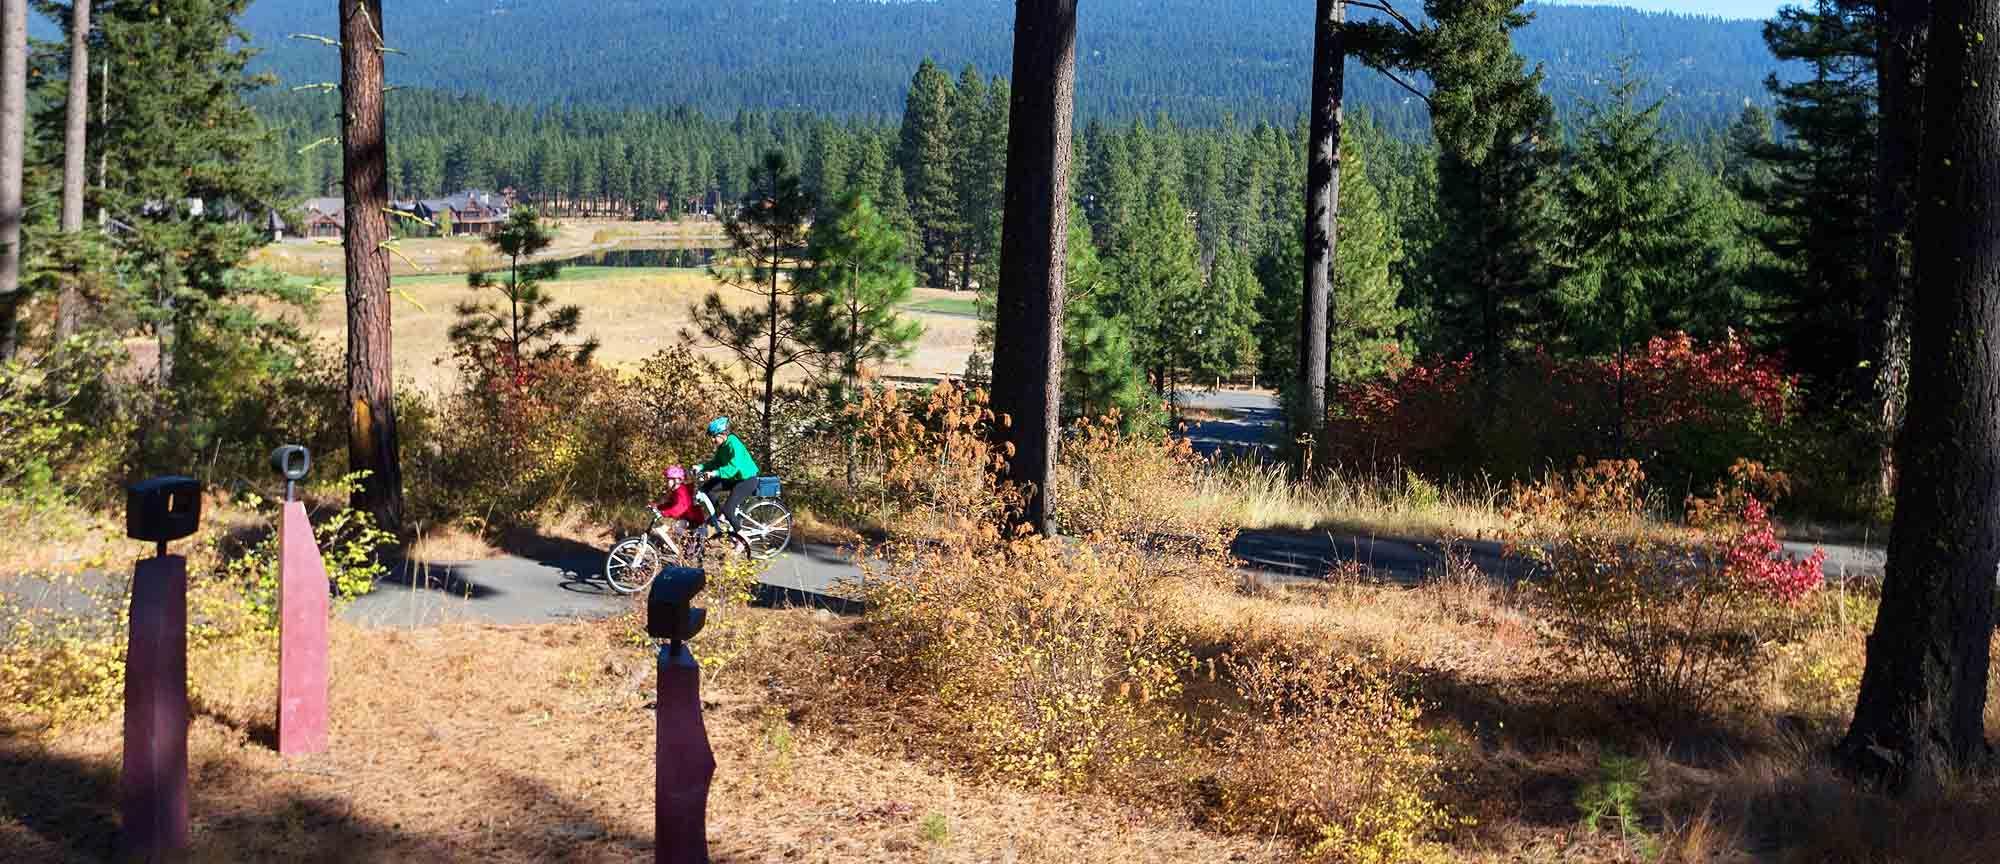 Bike Trails Washington State Suncadia Resort Trails